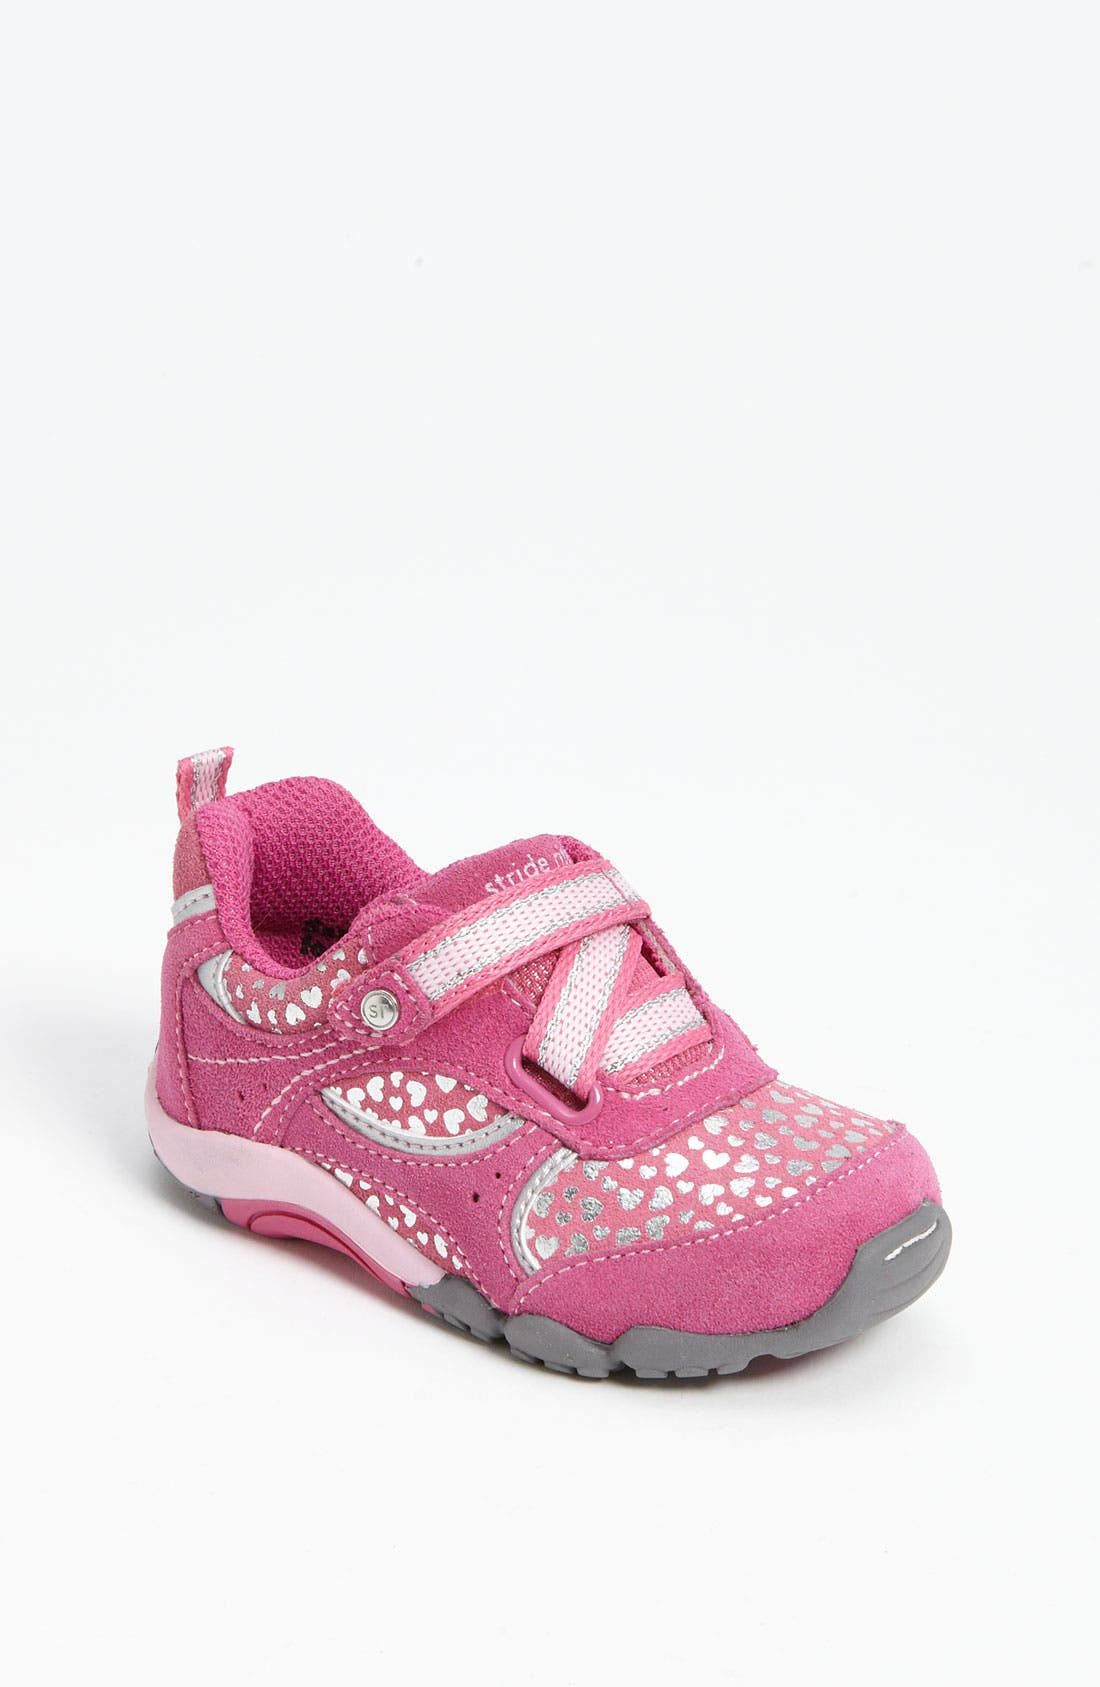 Alternate Image 1 Selected - Stride Rite 'Misty' Sneaker (Baby, Walker & Toddler)